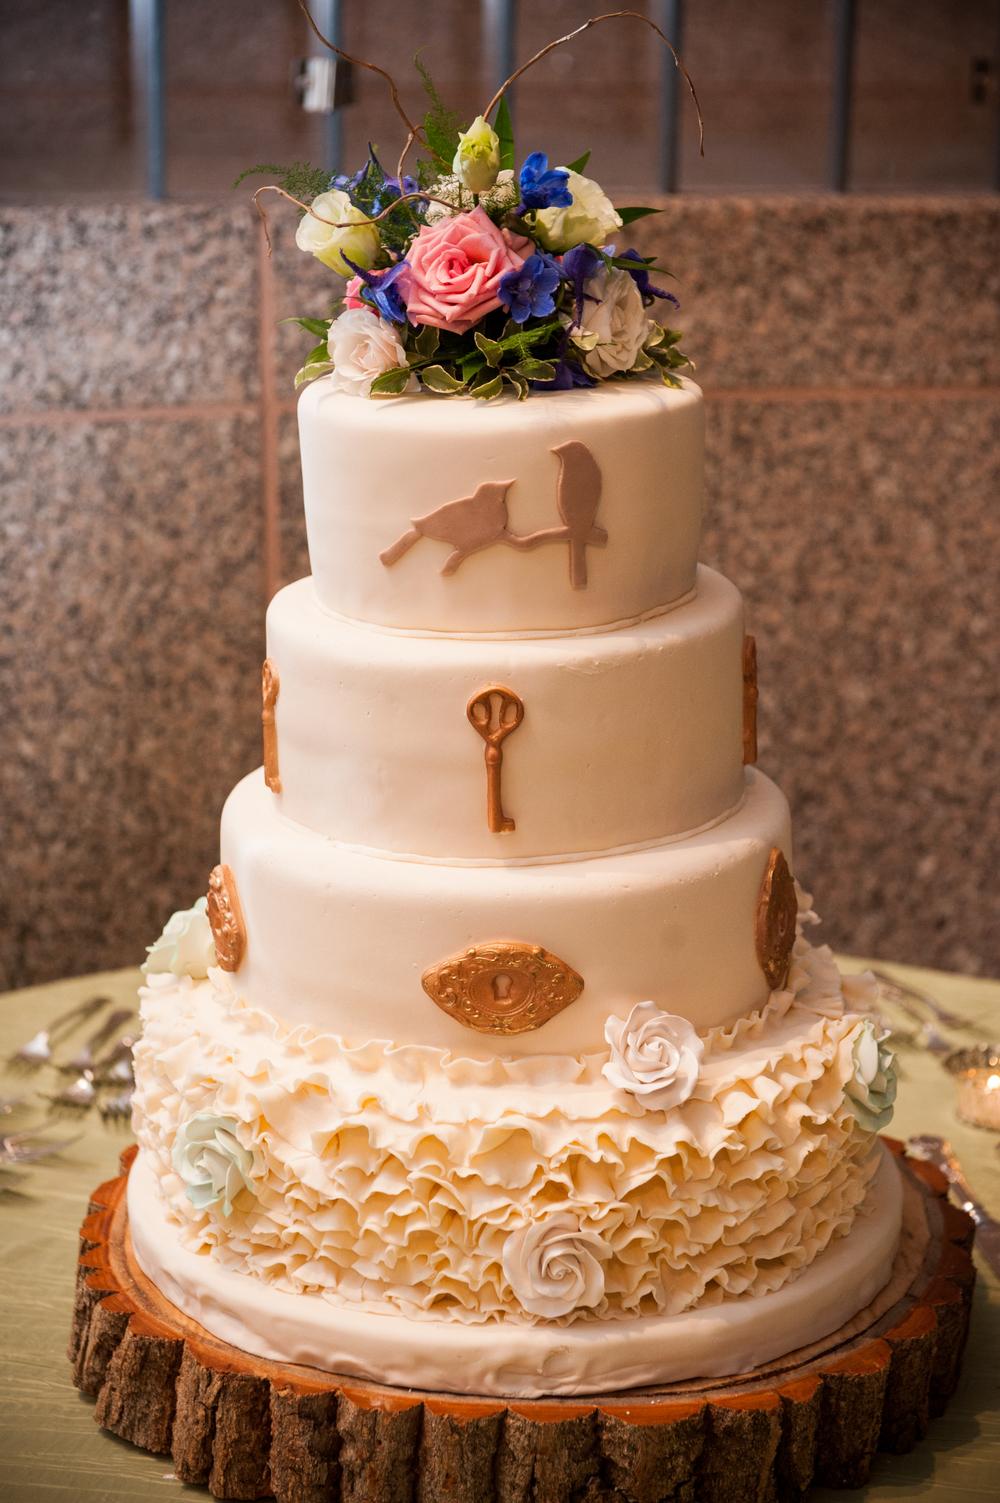 Ruffles Cake | Edible Art Bakery of Raleigh